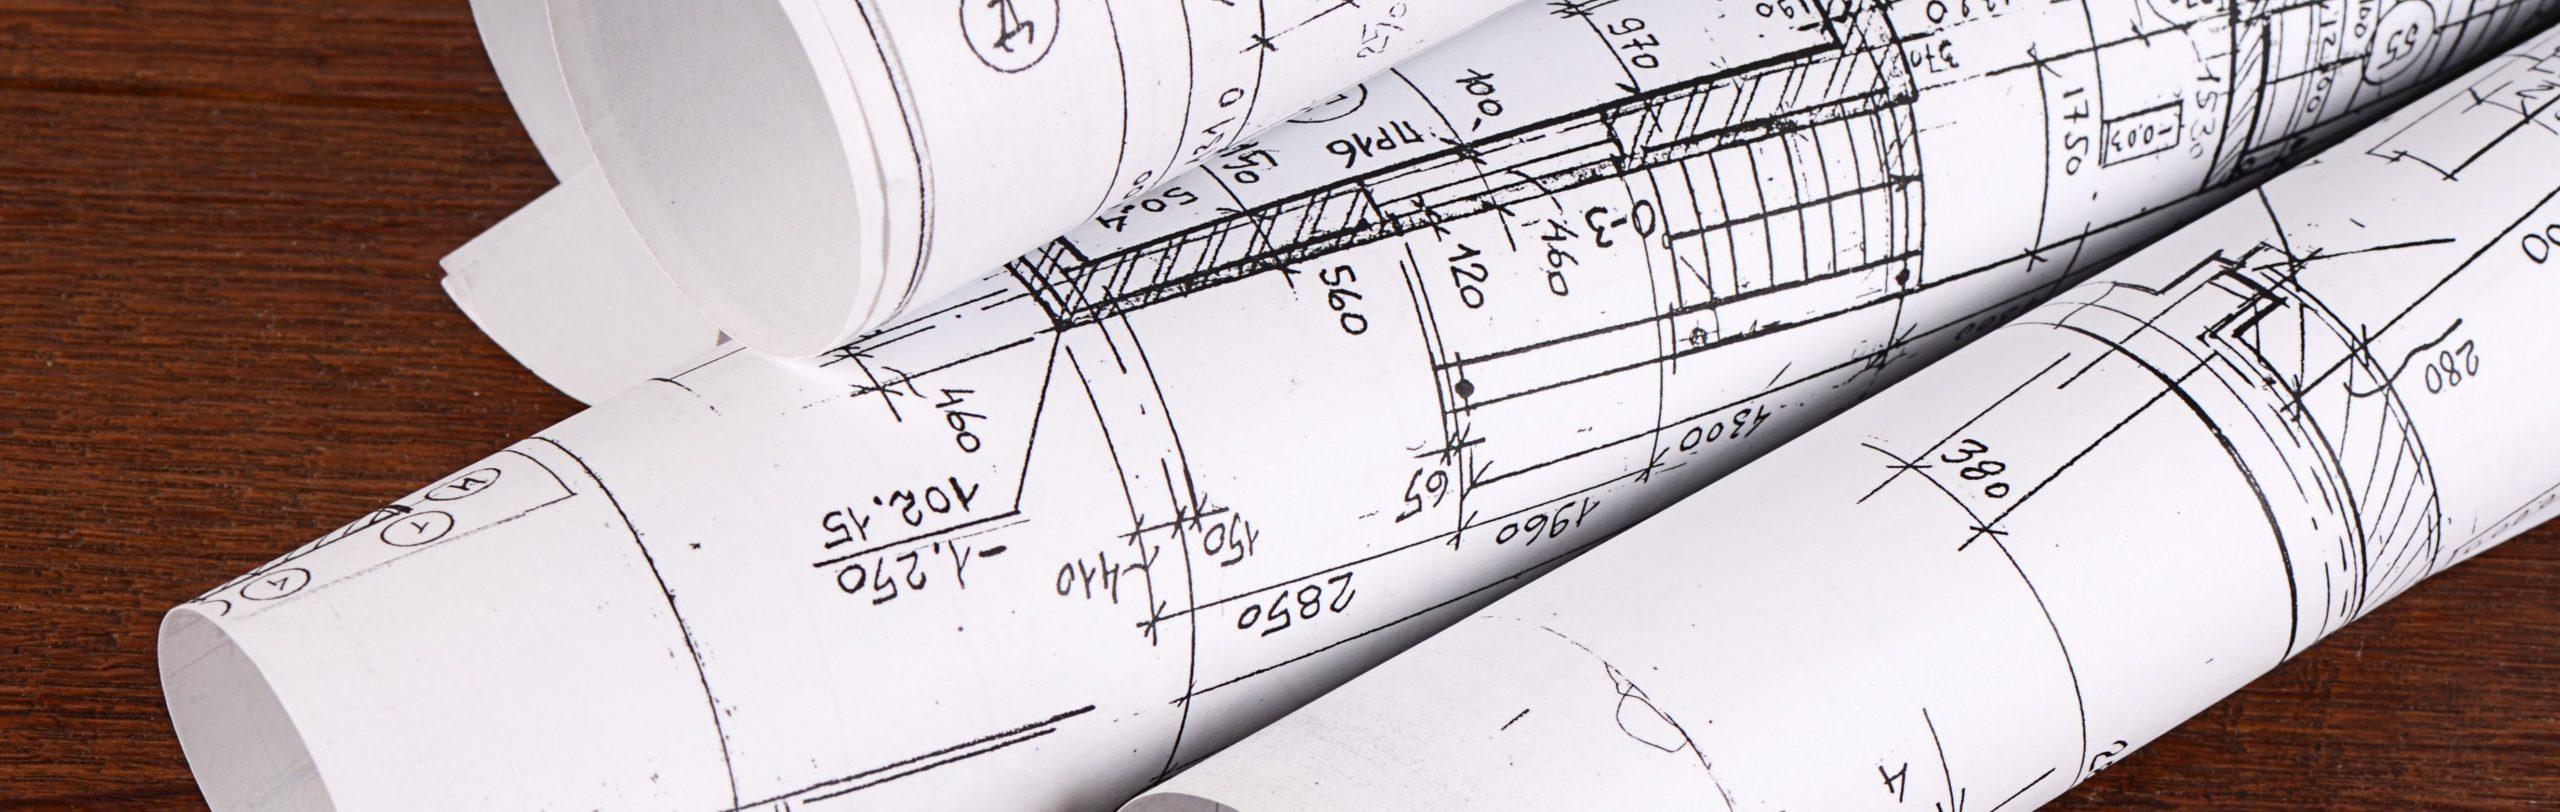 blueprints for house